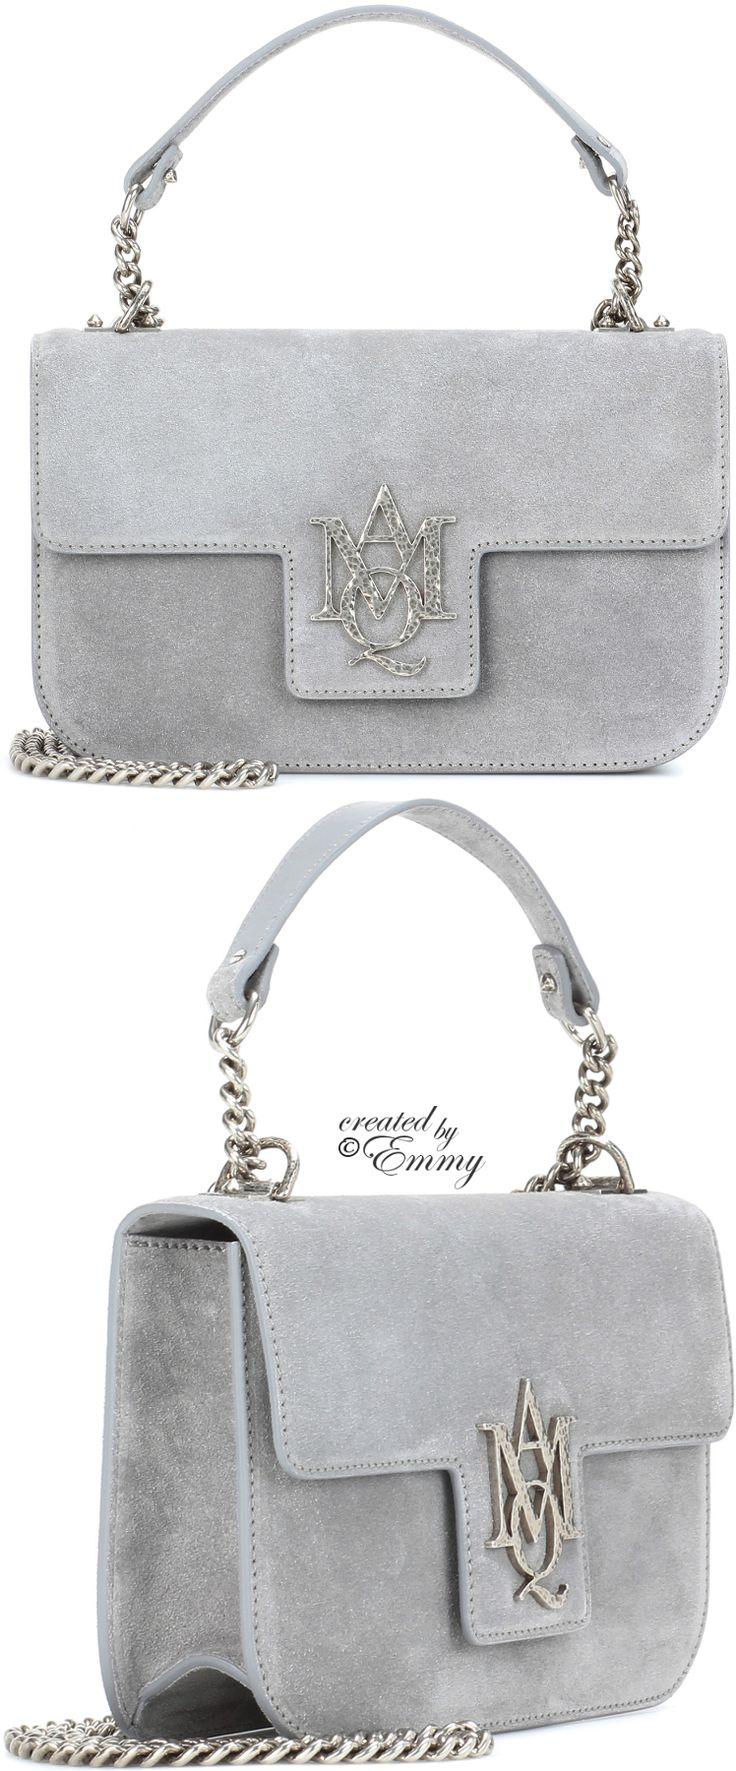 Emmy De Alexander Mcqueen Insignia Chain Satchel Ss 2017 Designer Pursesdesigner Handbagsgrey